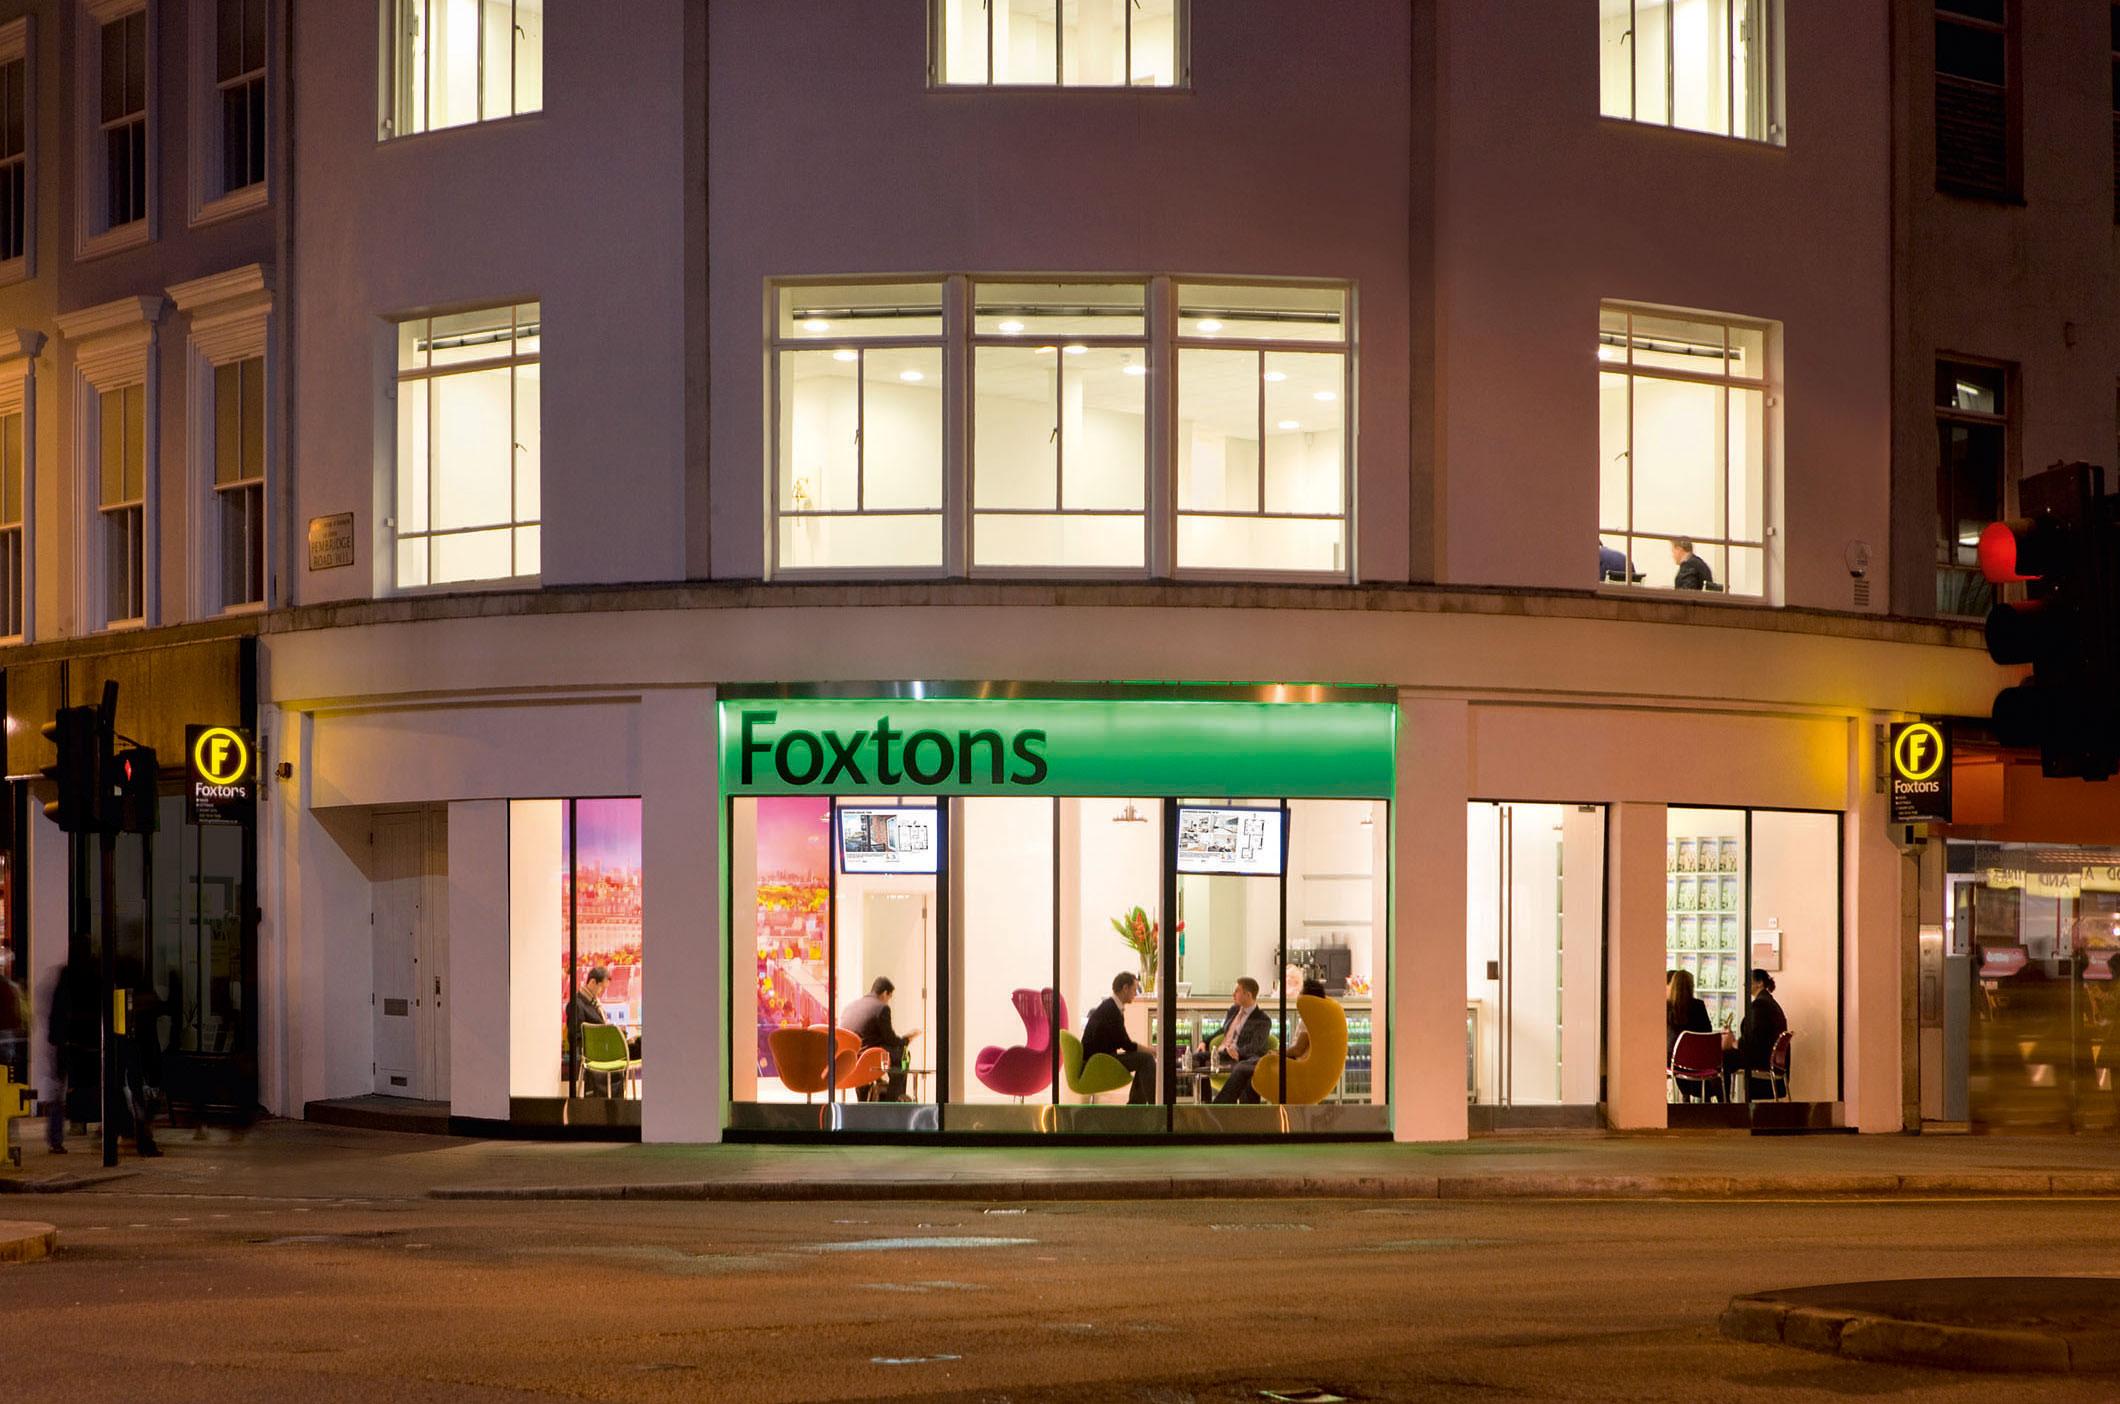 Foxtons - London, London W11 3HP - 020 7616 7000   ShowMeLocal.com